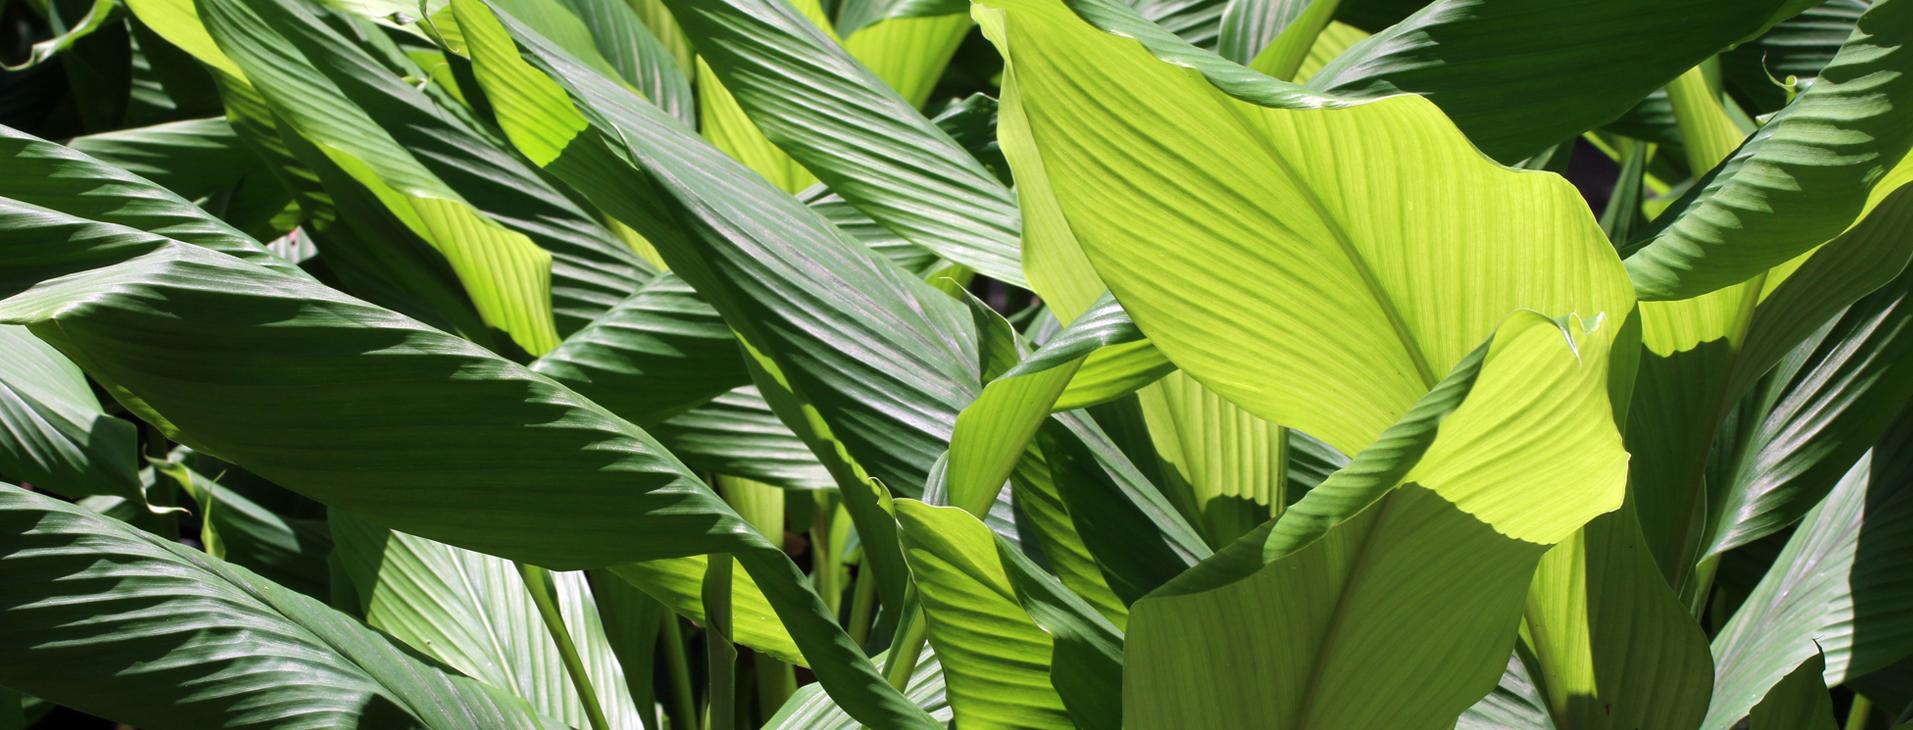 nutraceutical turmeric plant